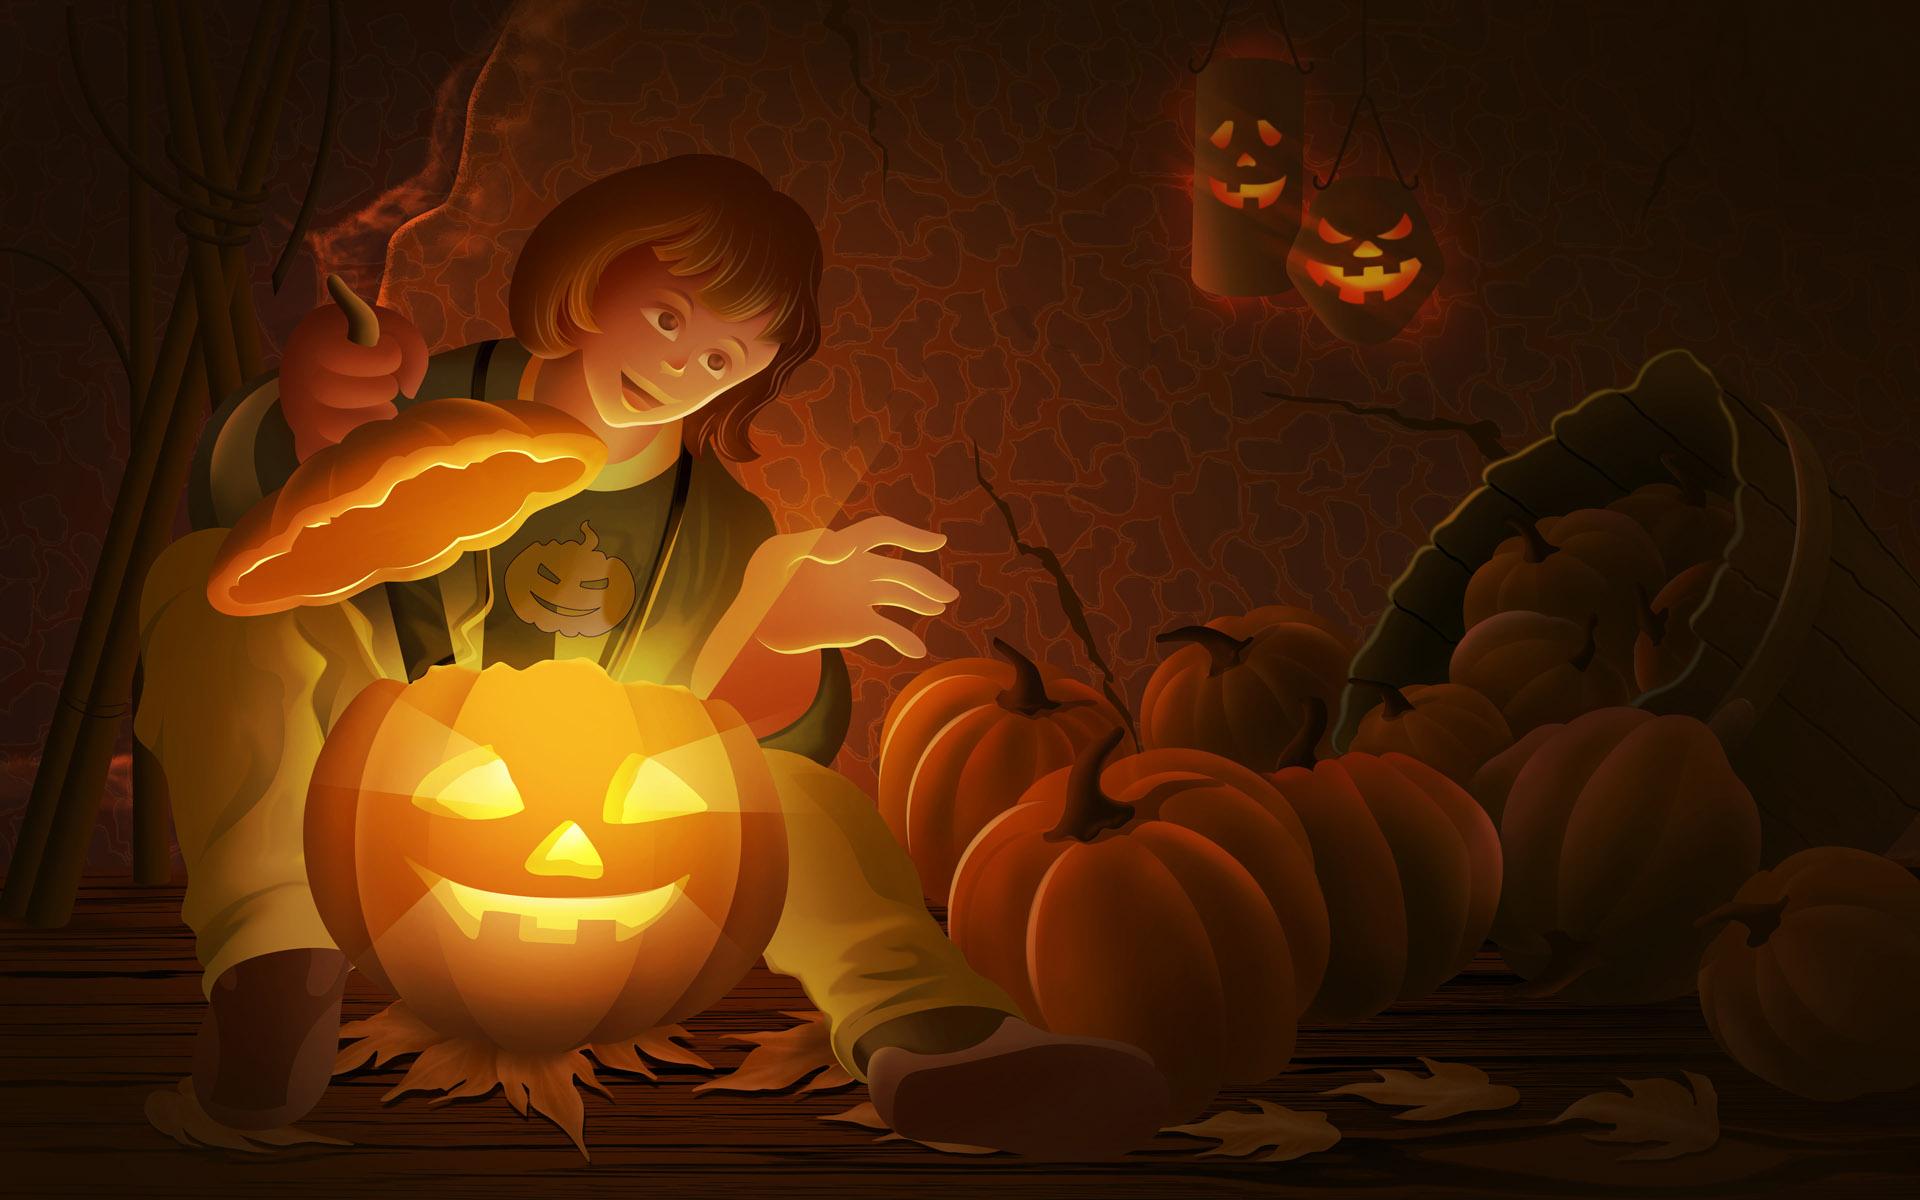 Halloween Wallpaper 11 1920x1200